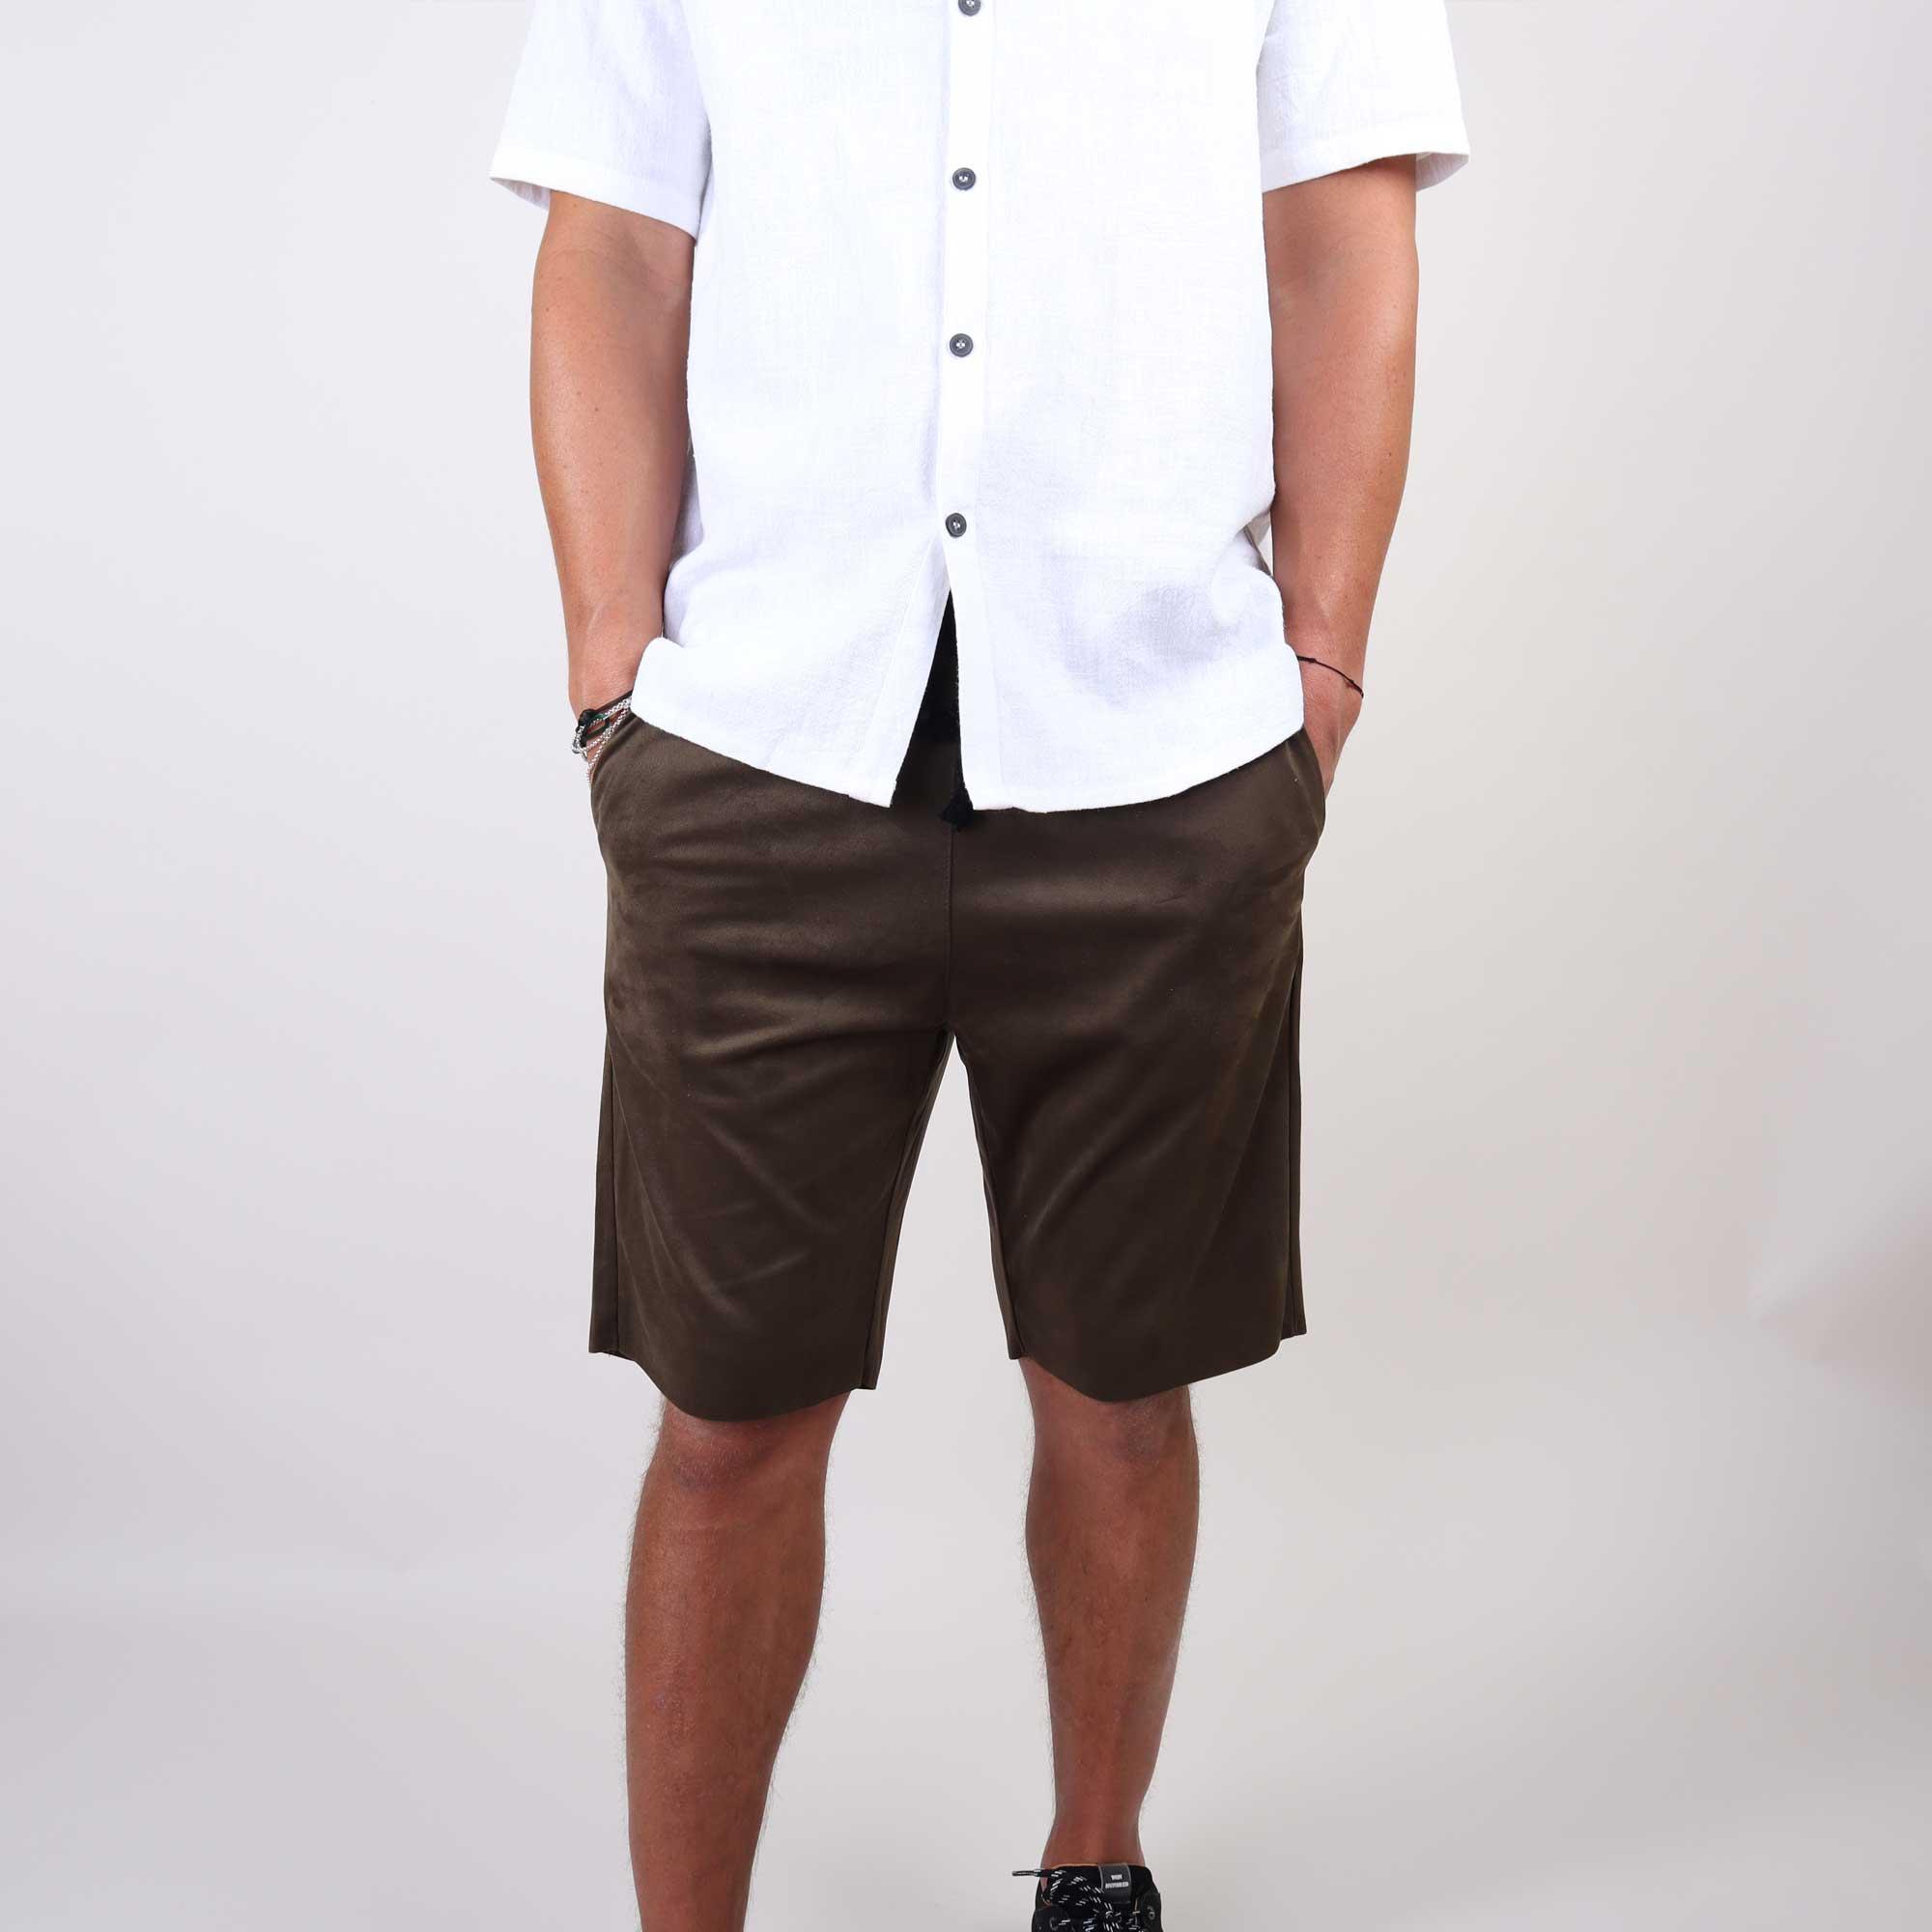 shorts-suede-forrest-2